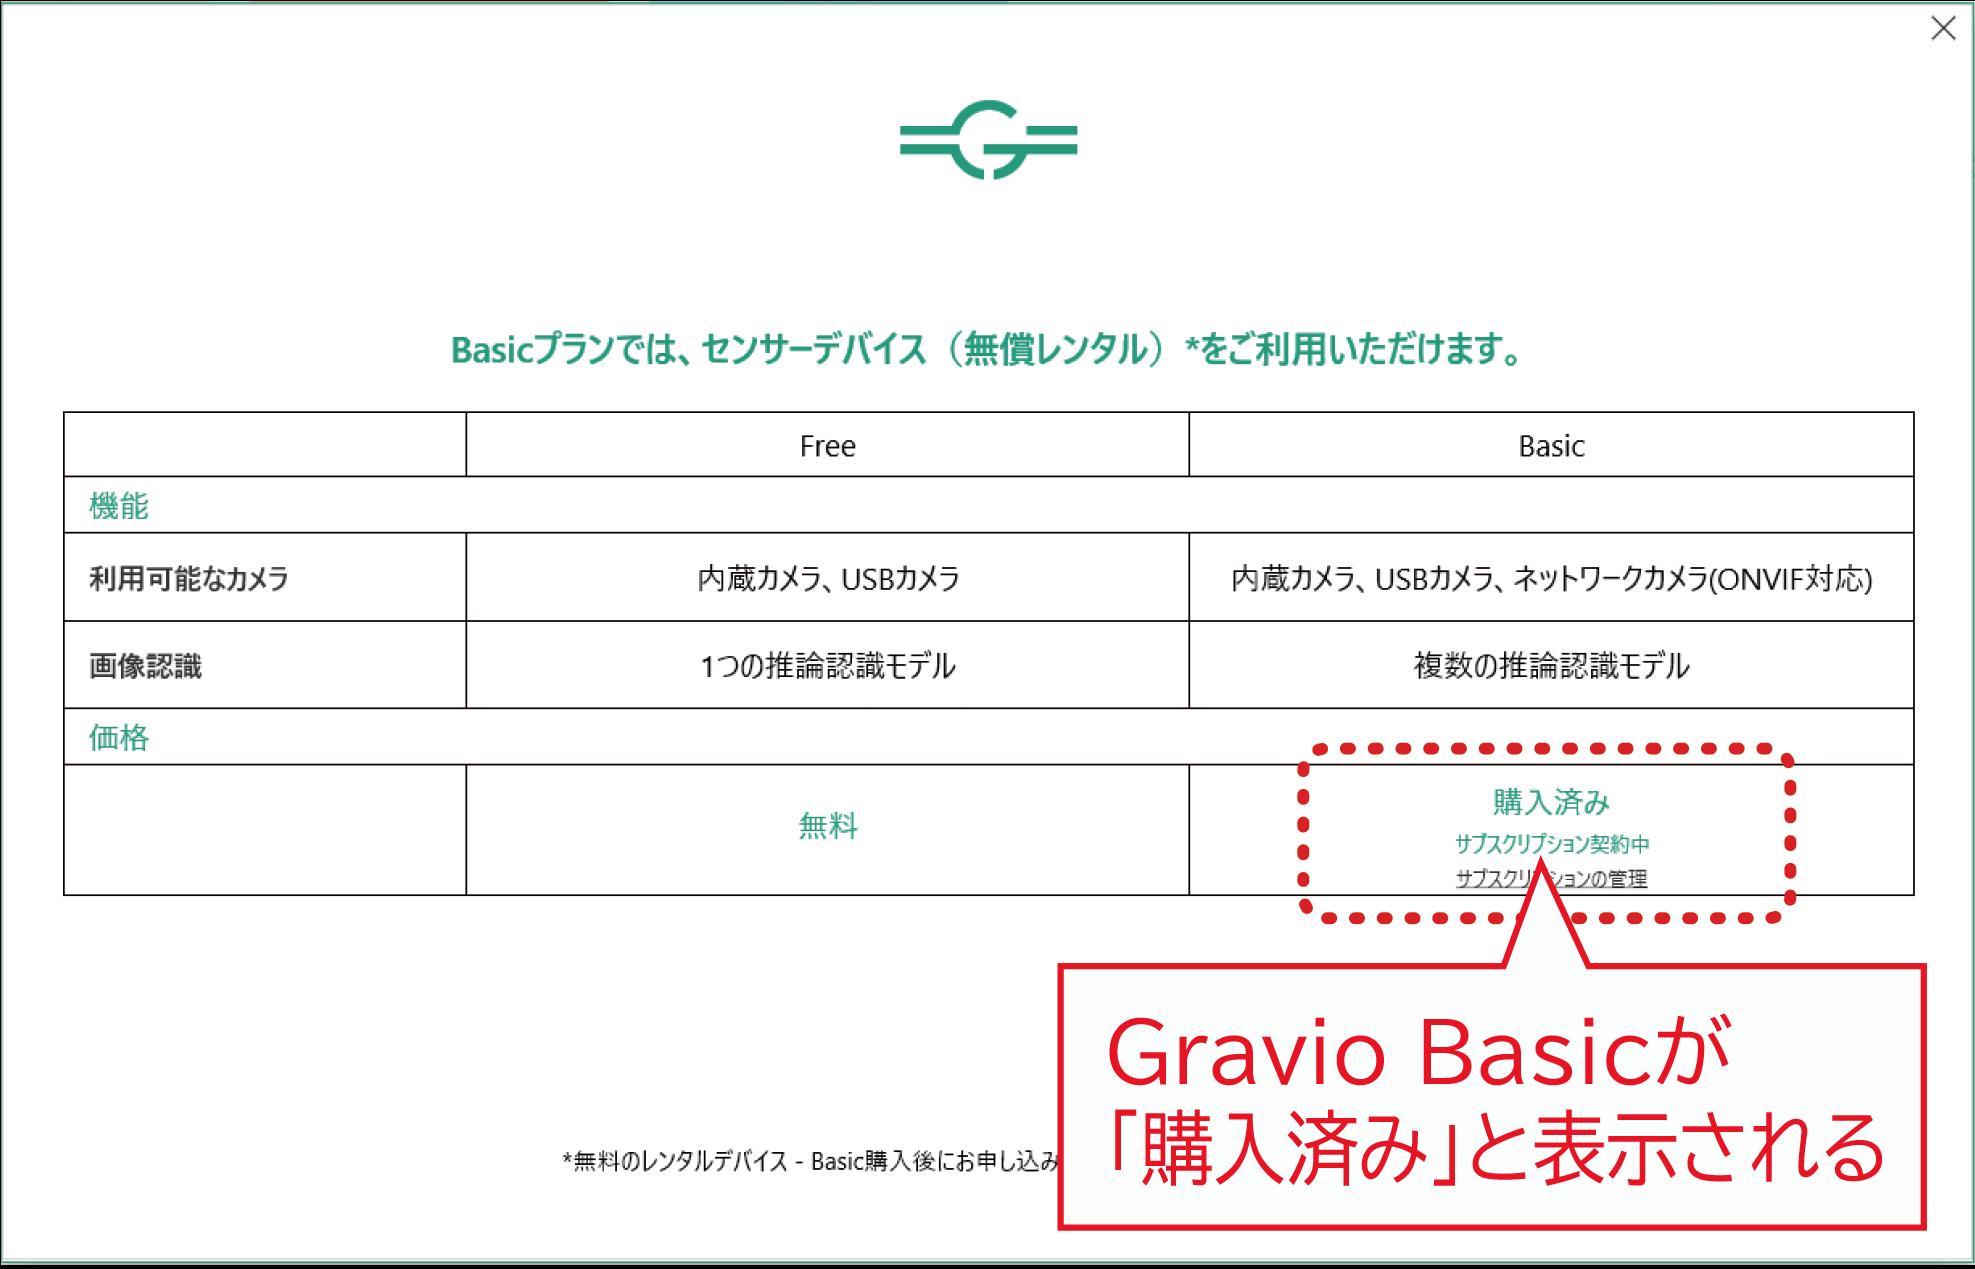 Gravio Basic 購入済み